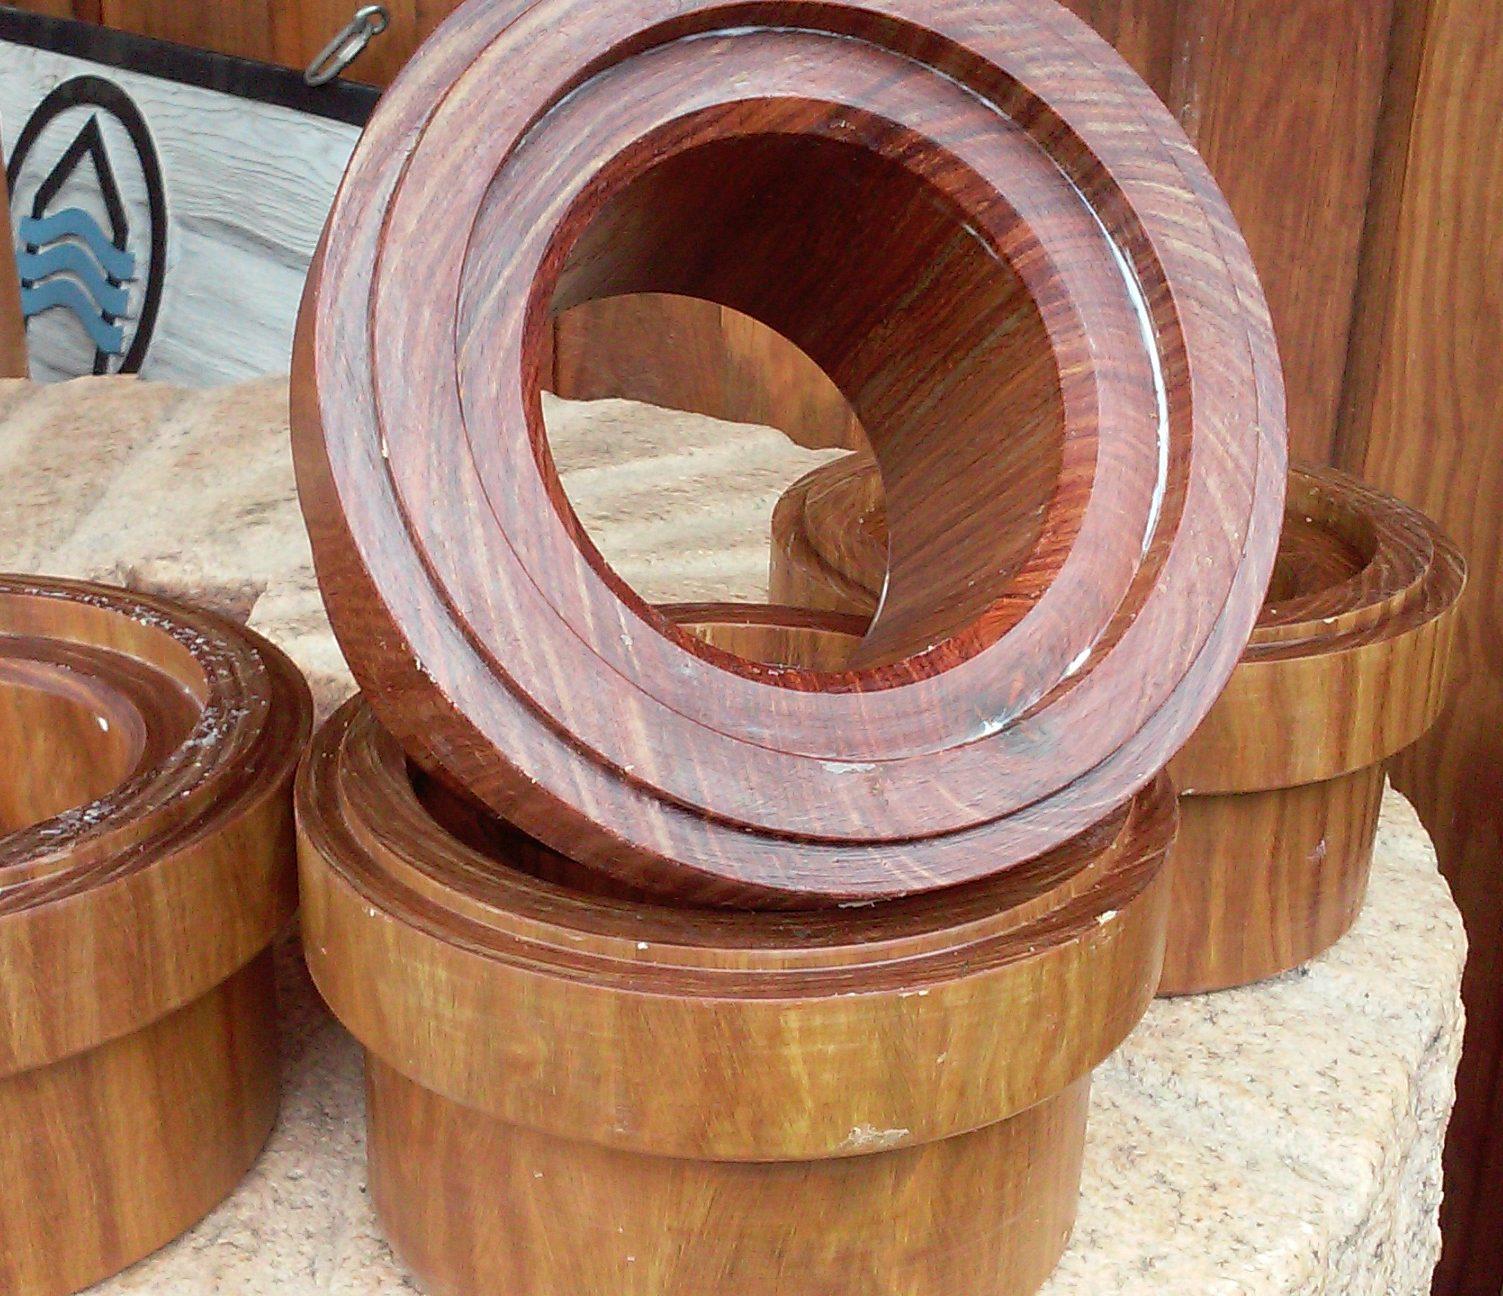 Wood bearings - Woods Bearings & Bushings - Jacks Small Engines